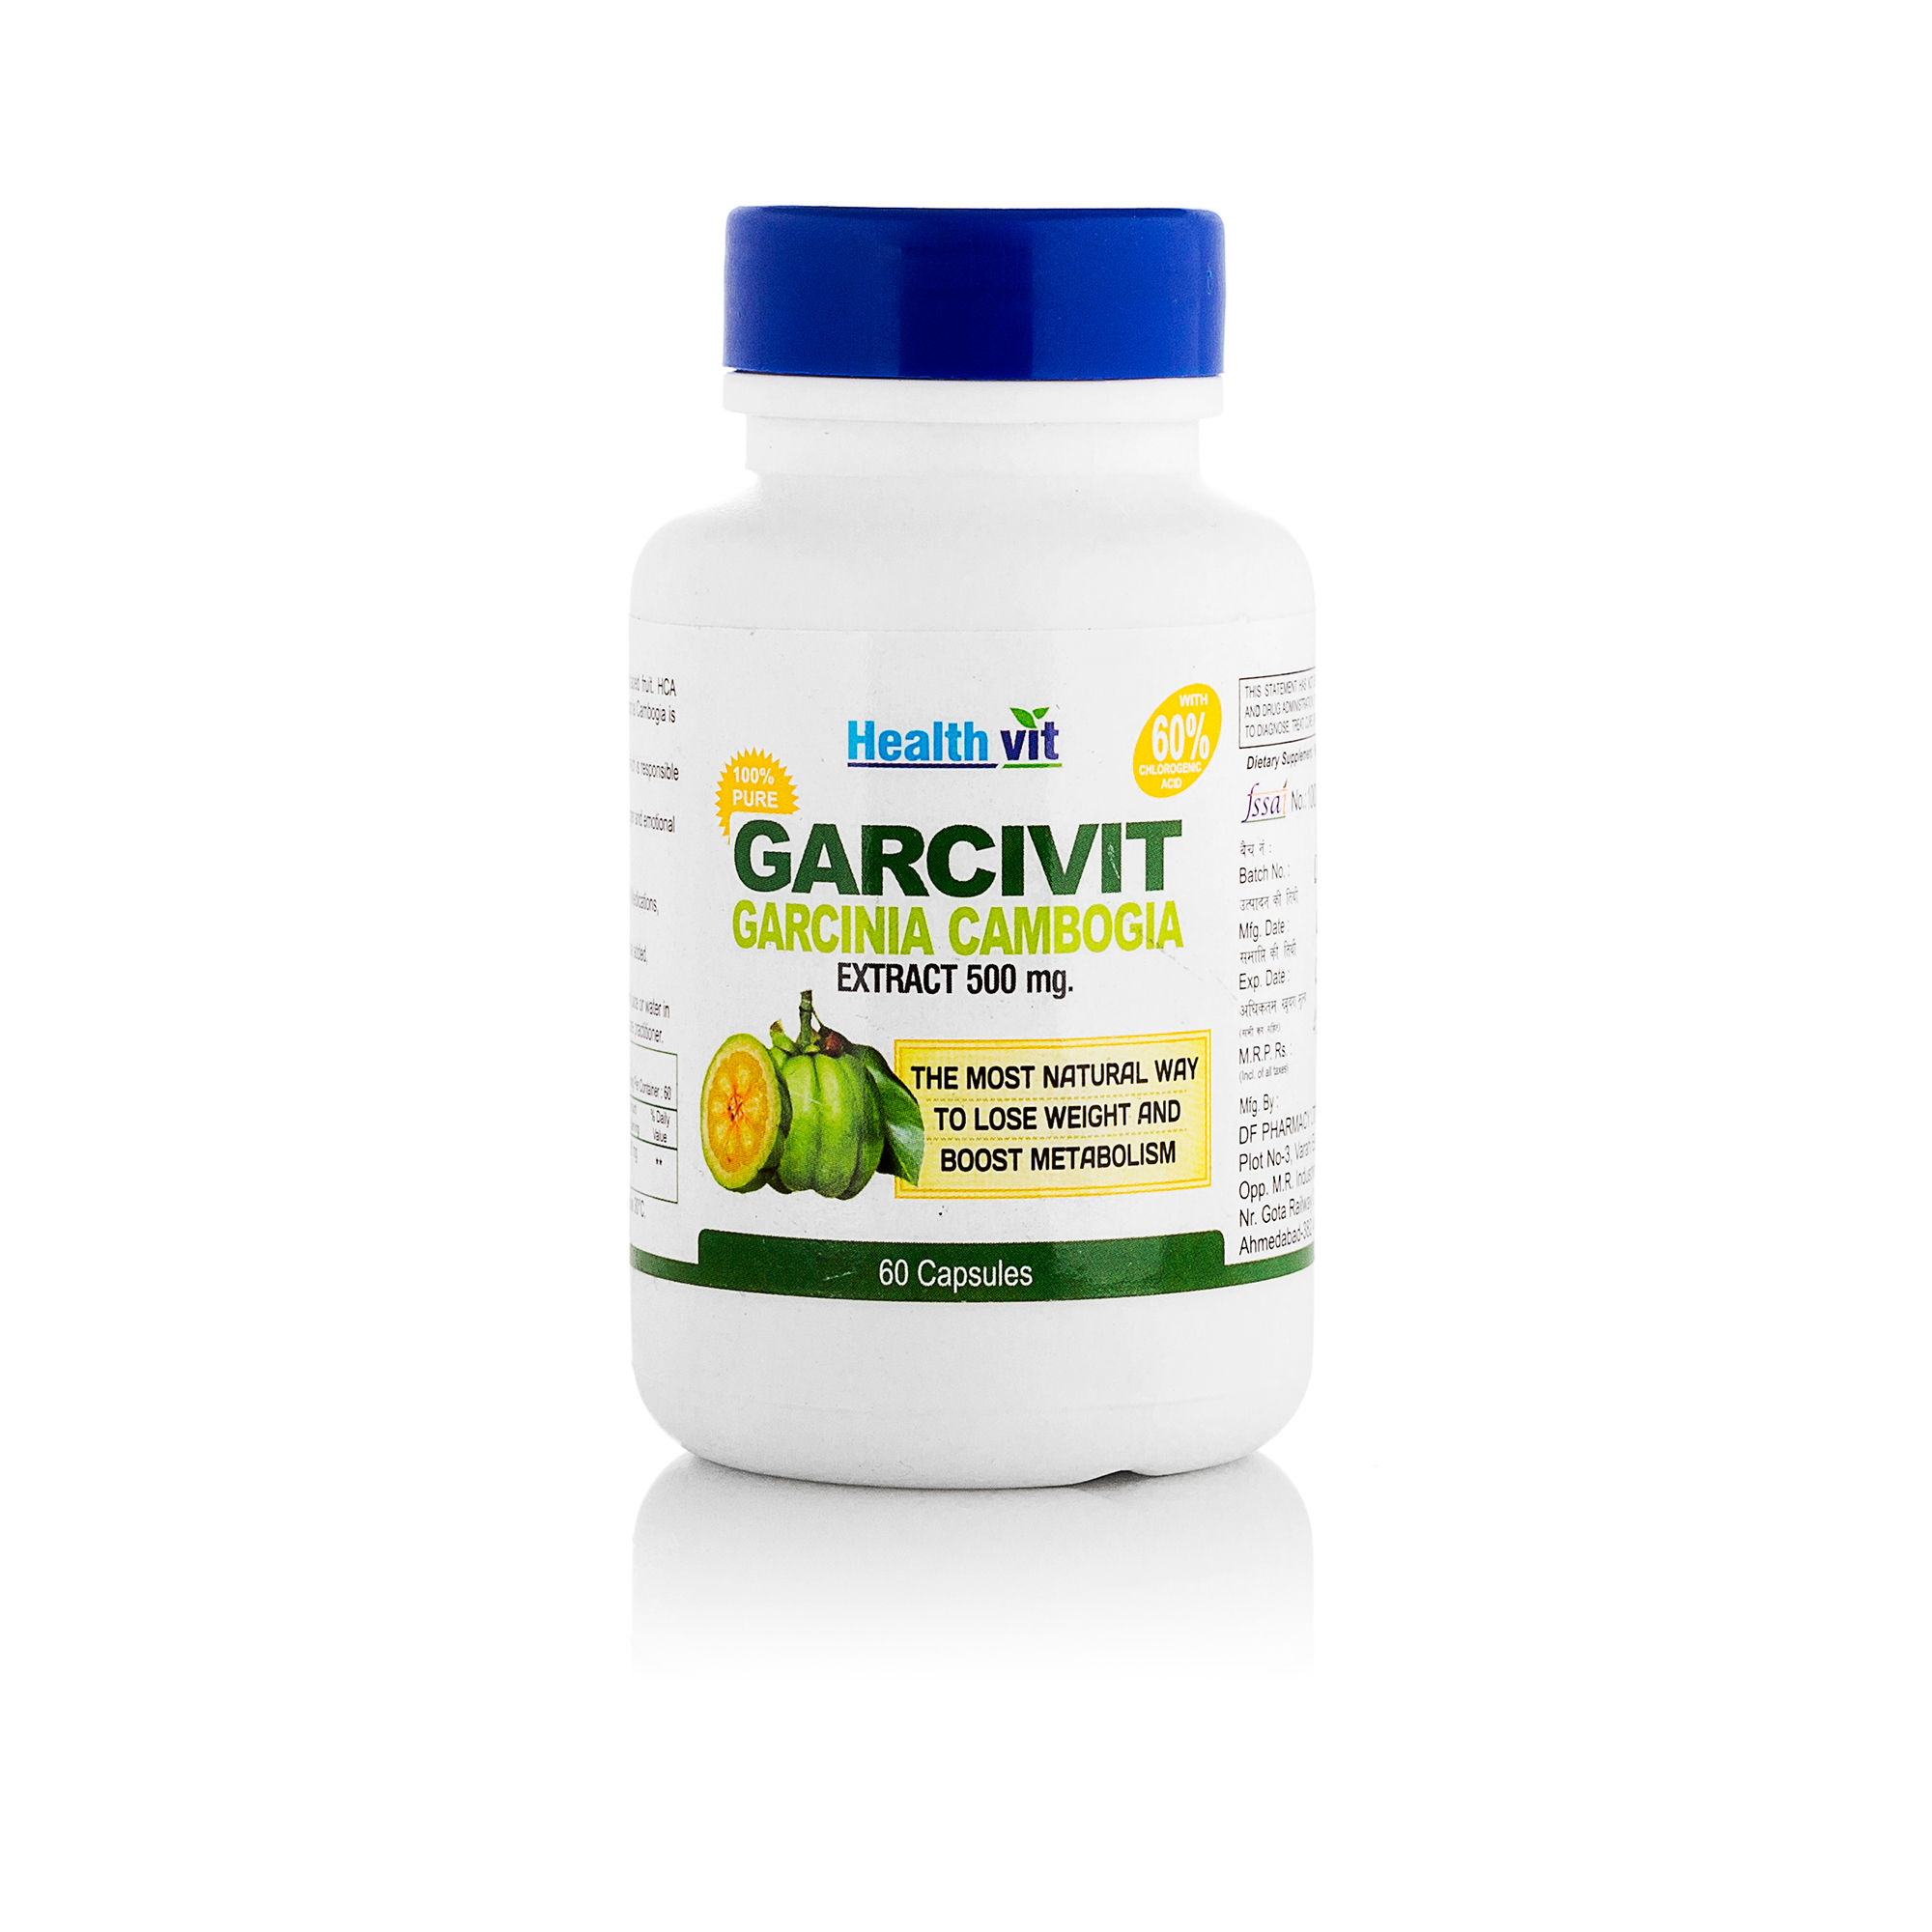 HealthVit Garcivit Garcinia Cambogia 500mg Supplements Pack Of 2